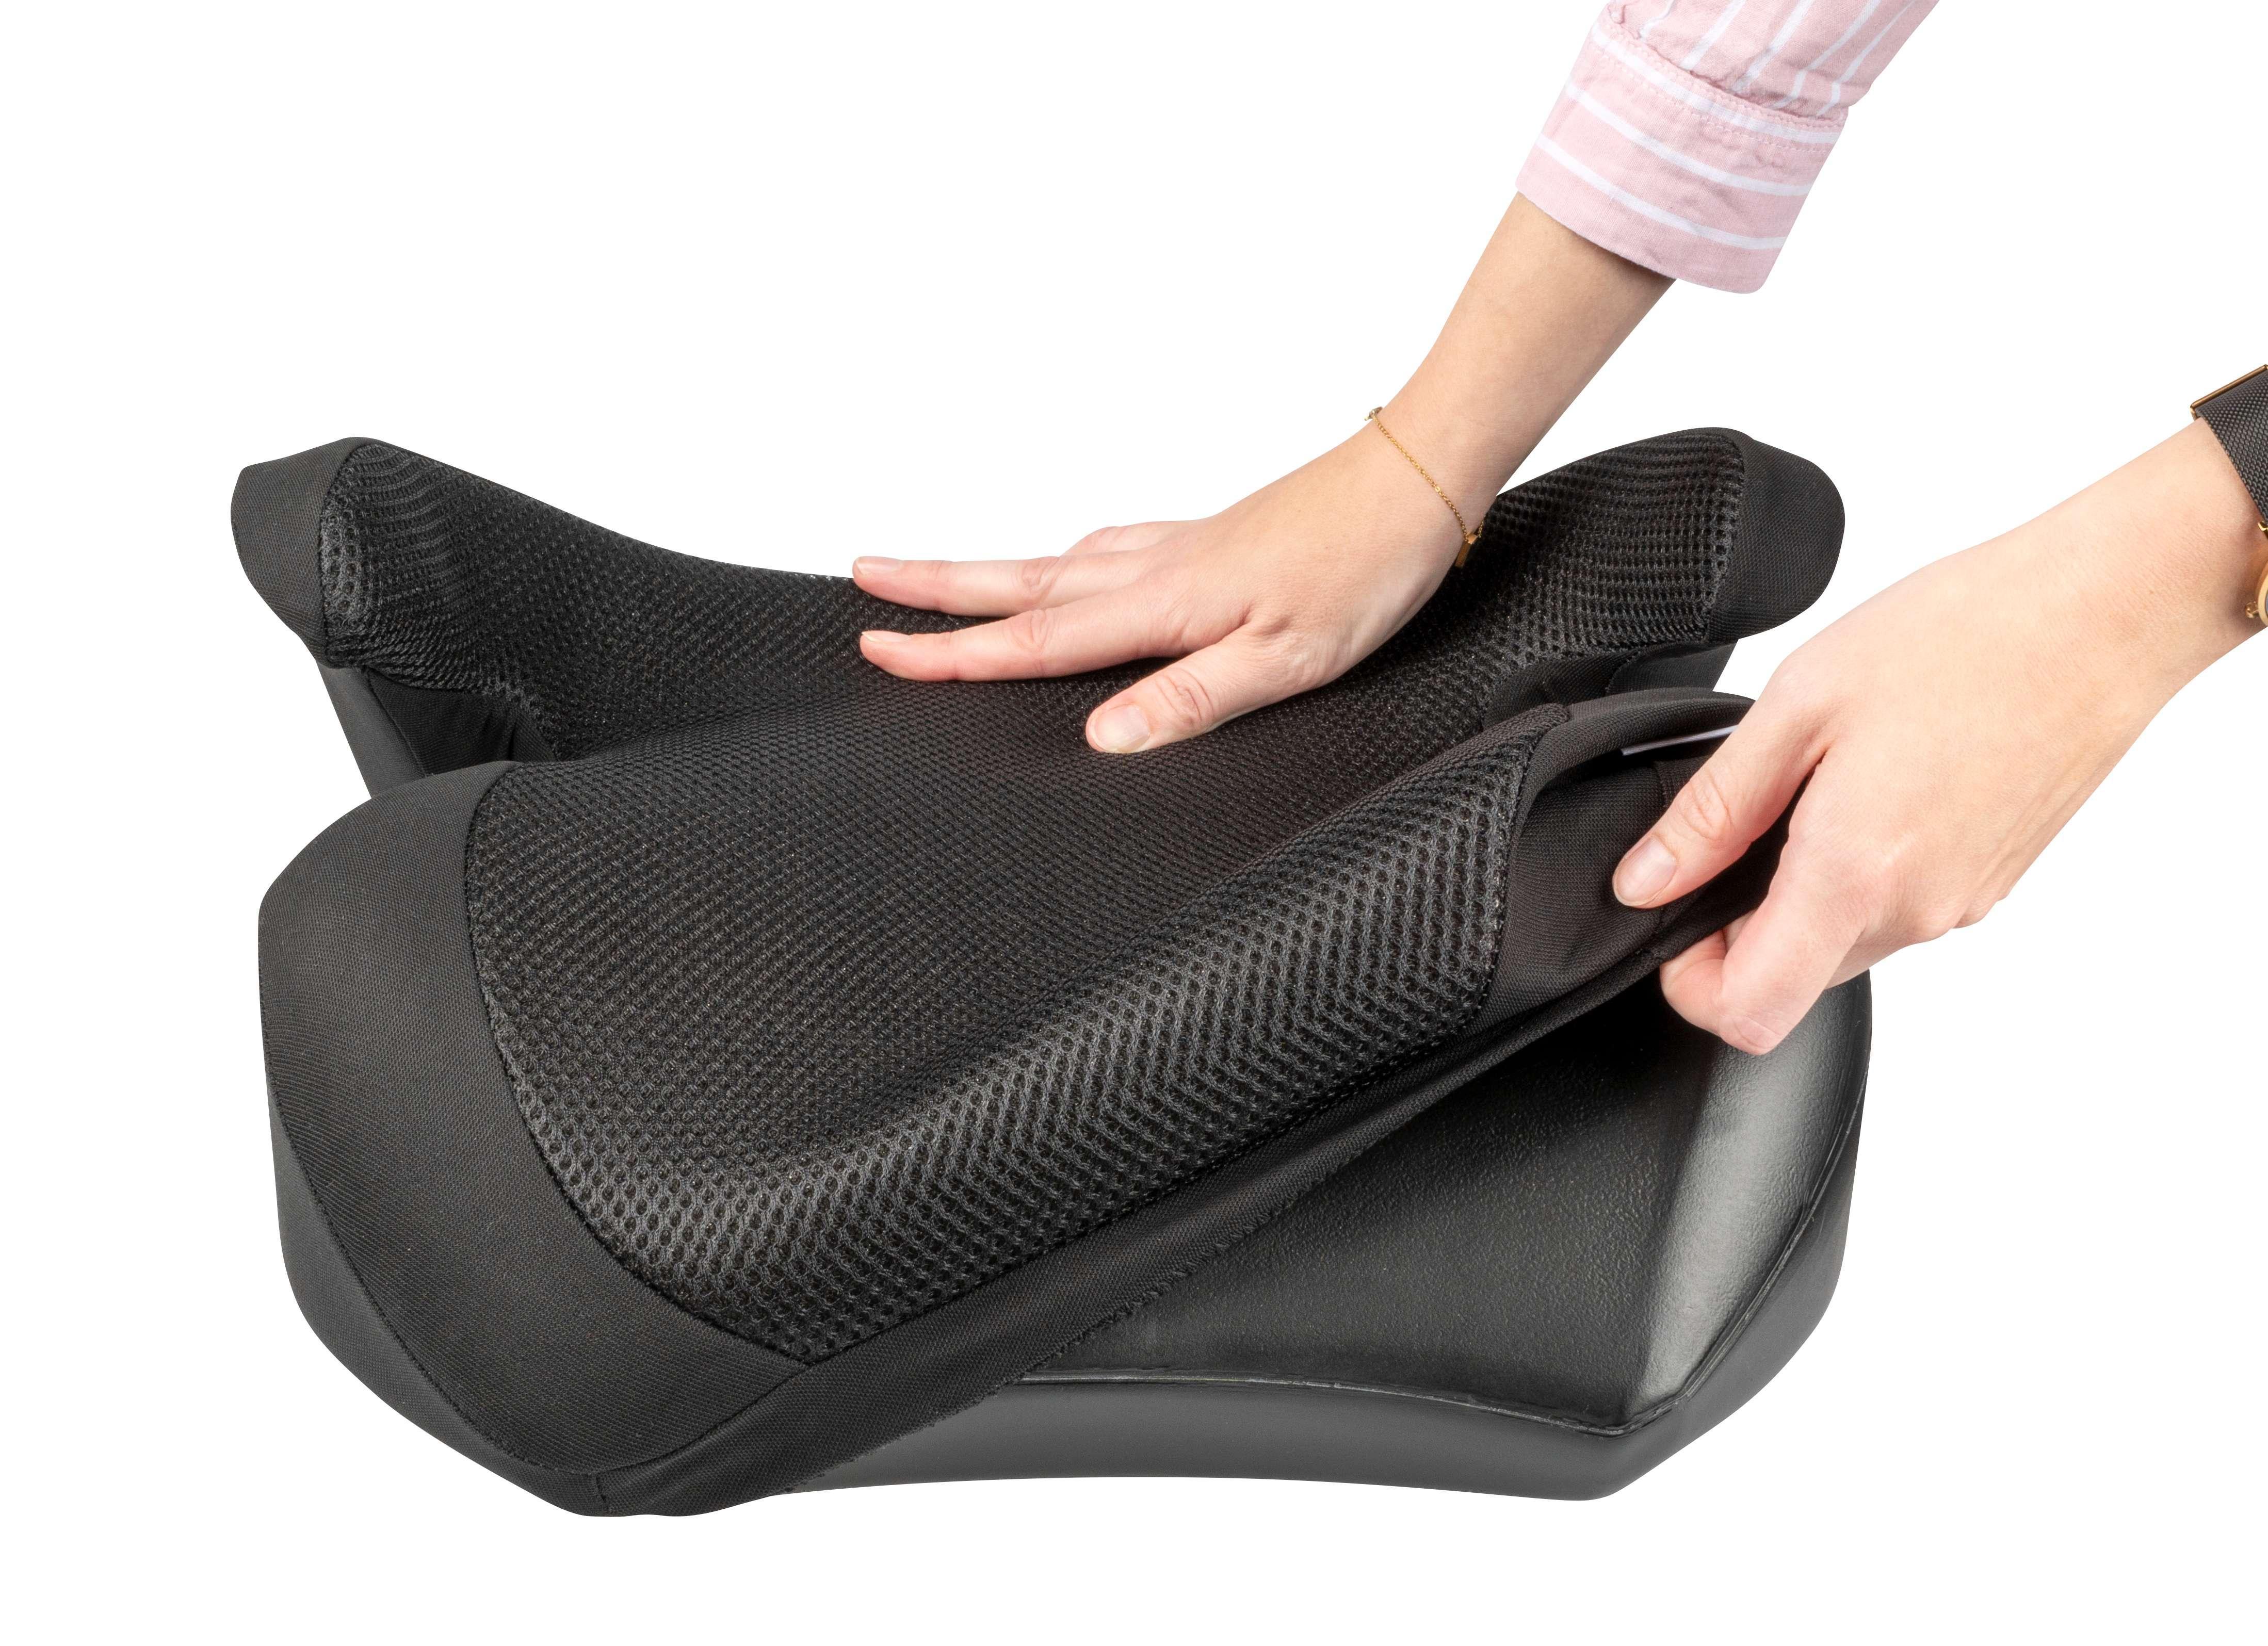 Бустер седалка WALSER 15483 експертни познания